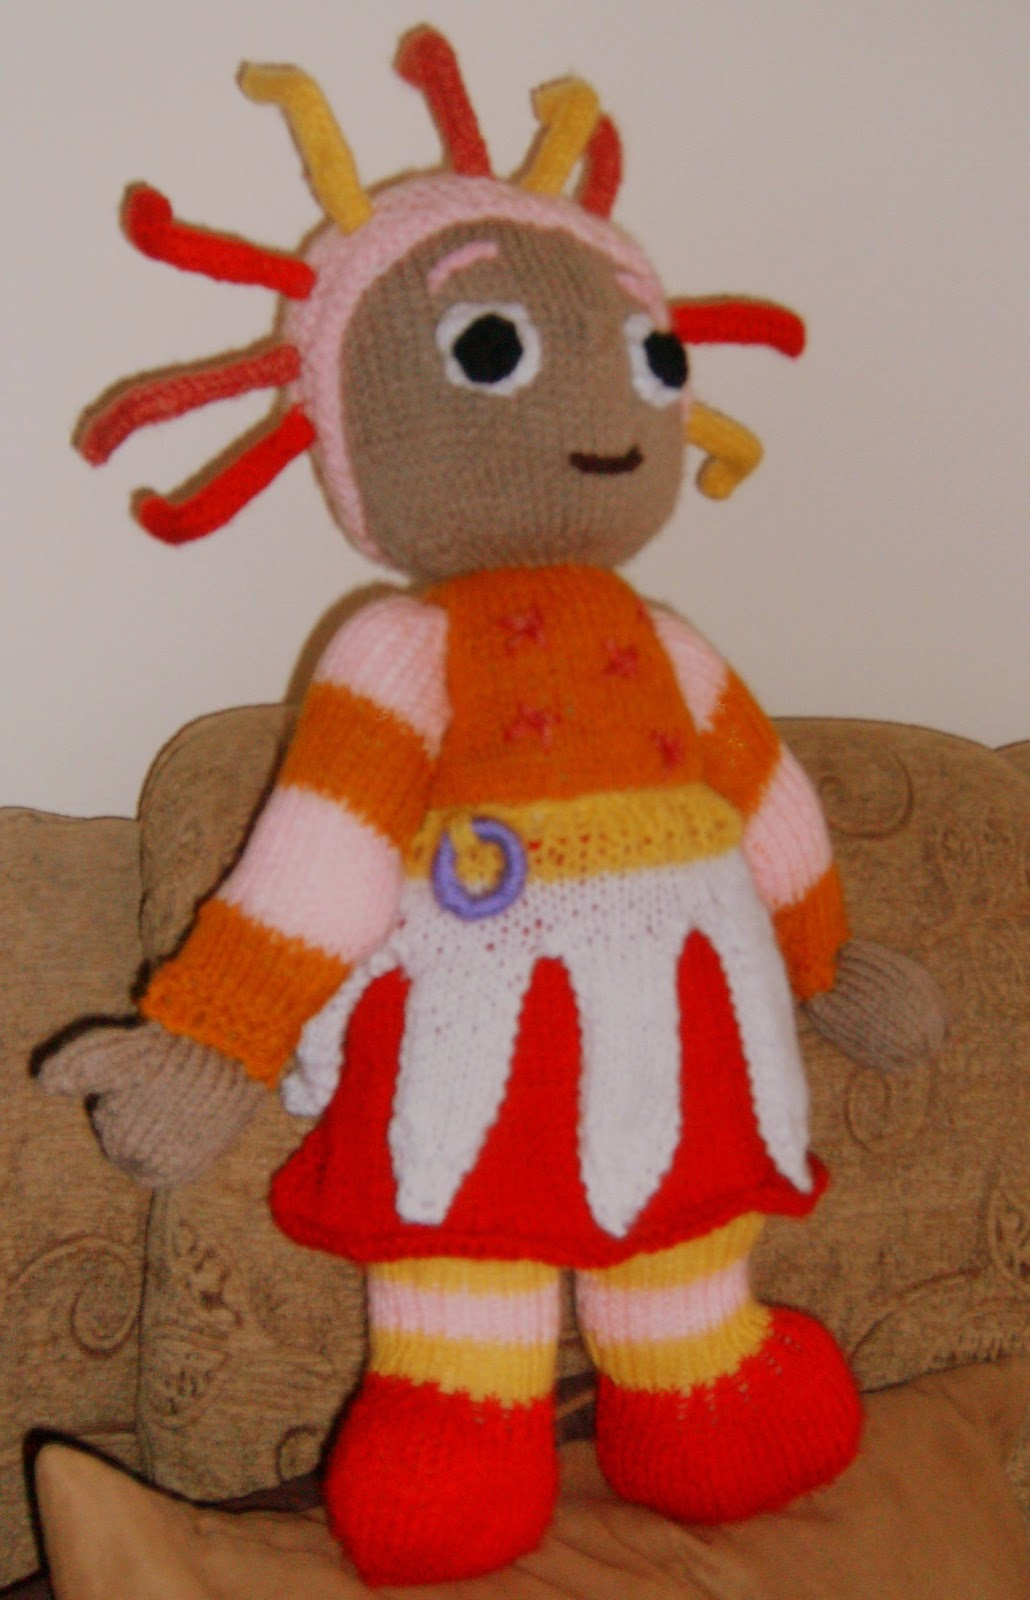 Knitting Pattern For Upsy Daisy : Knitting Addict: IN THE NIGHT GARDEN...UPSY-DA?SY